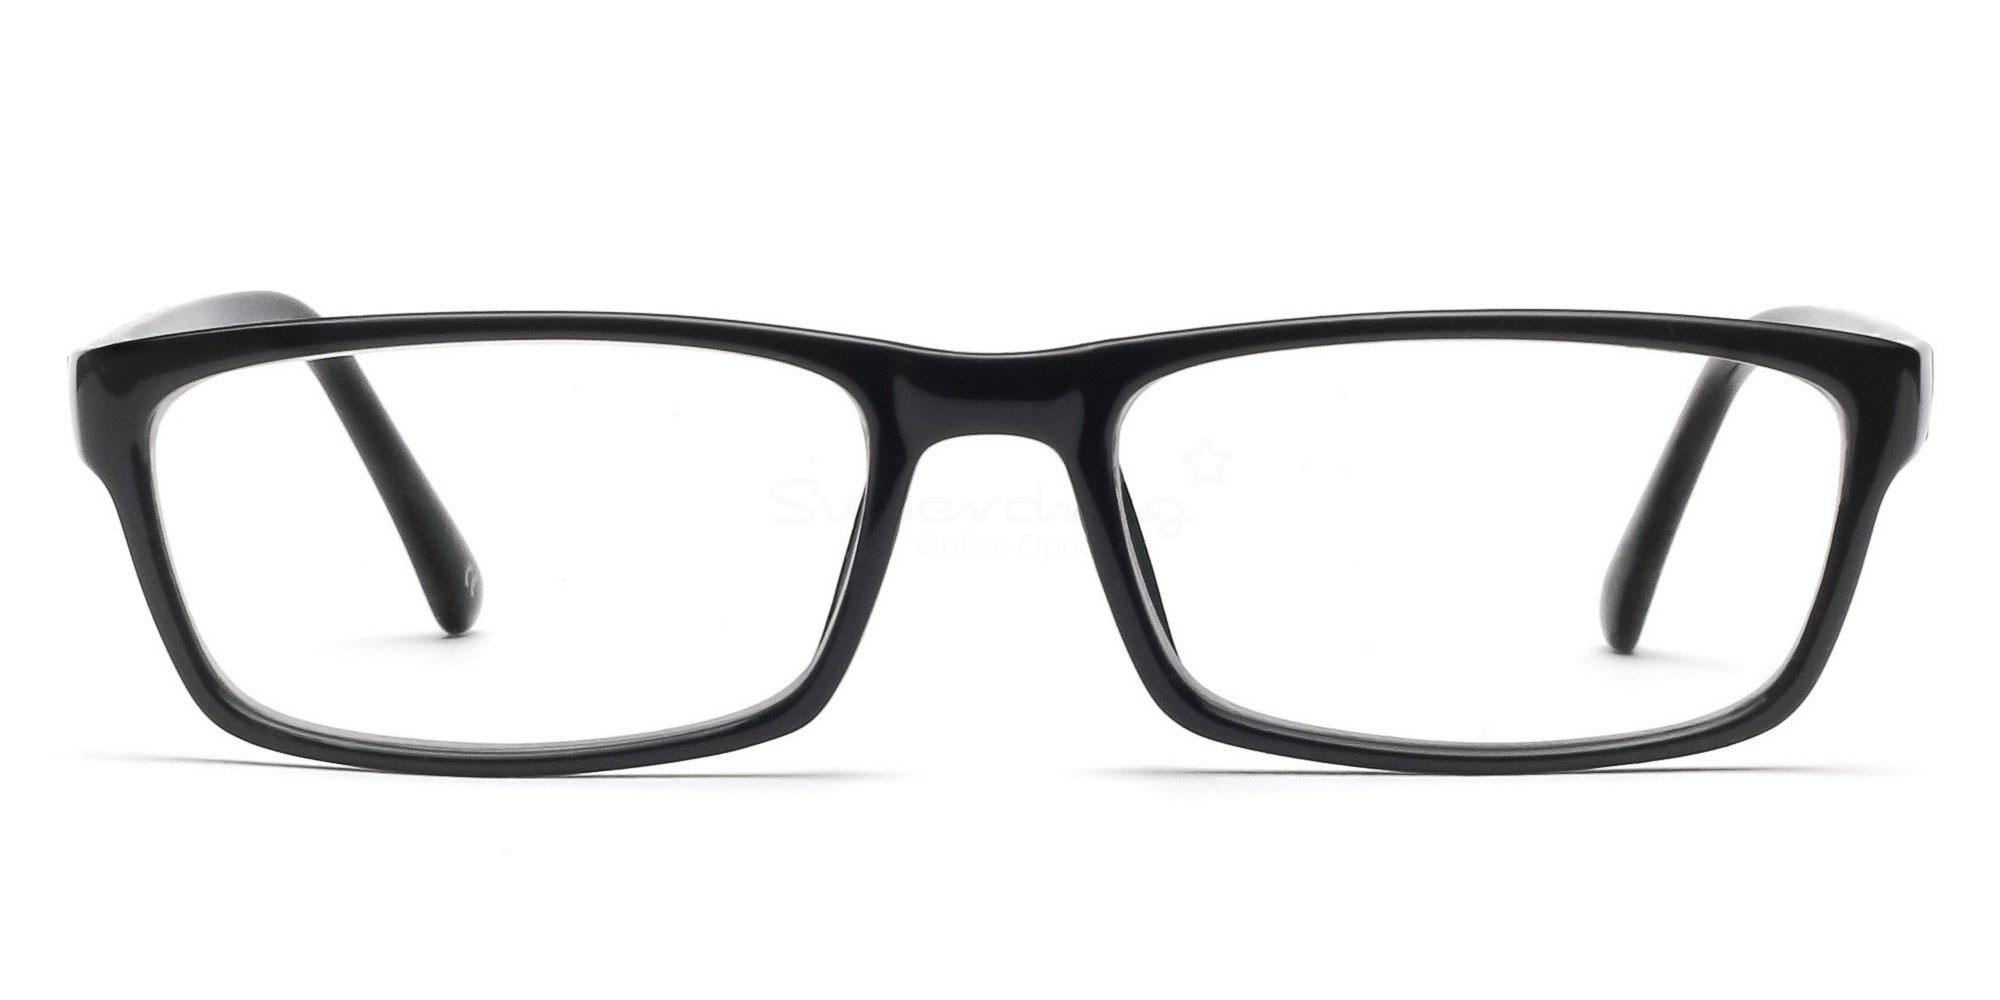 COL.01 2426 - Black Glasses, Helium